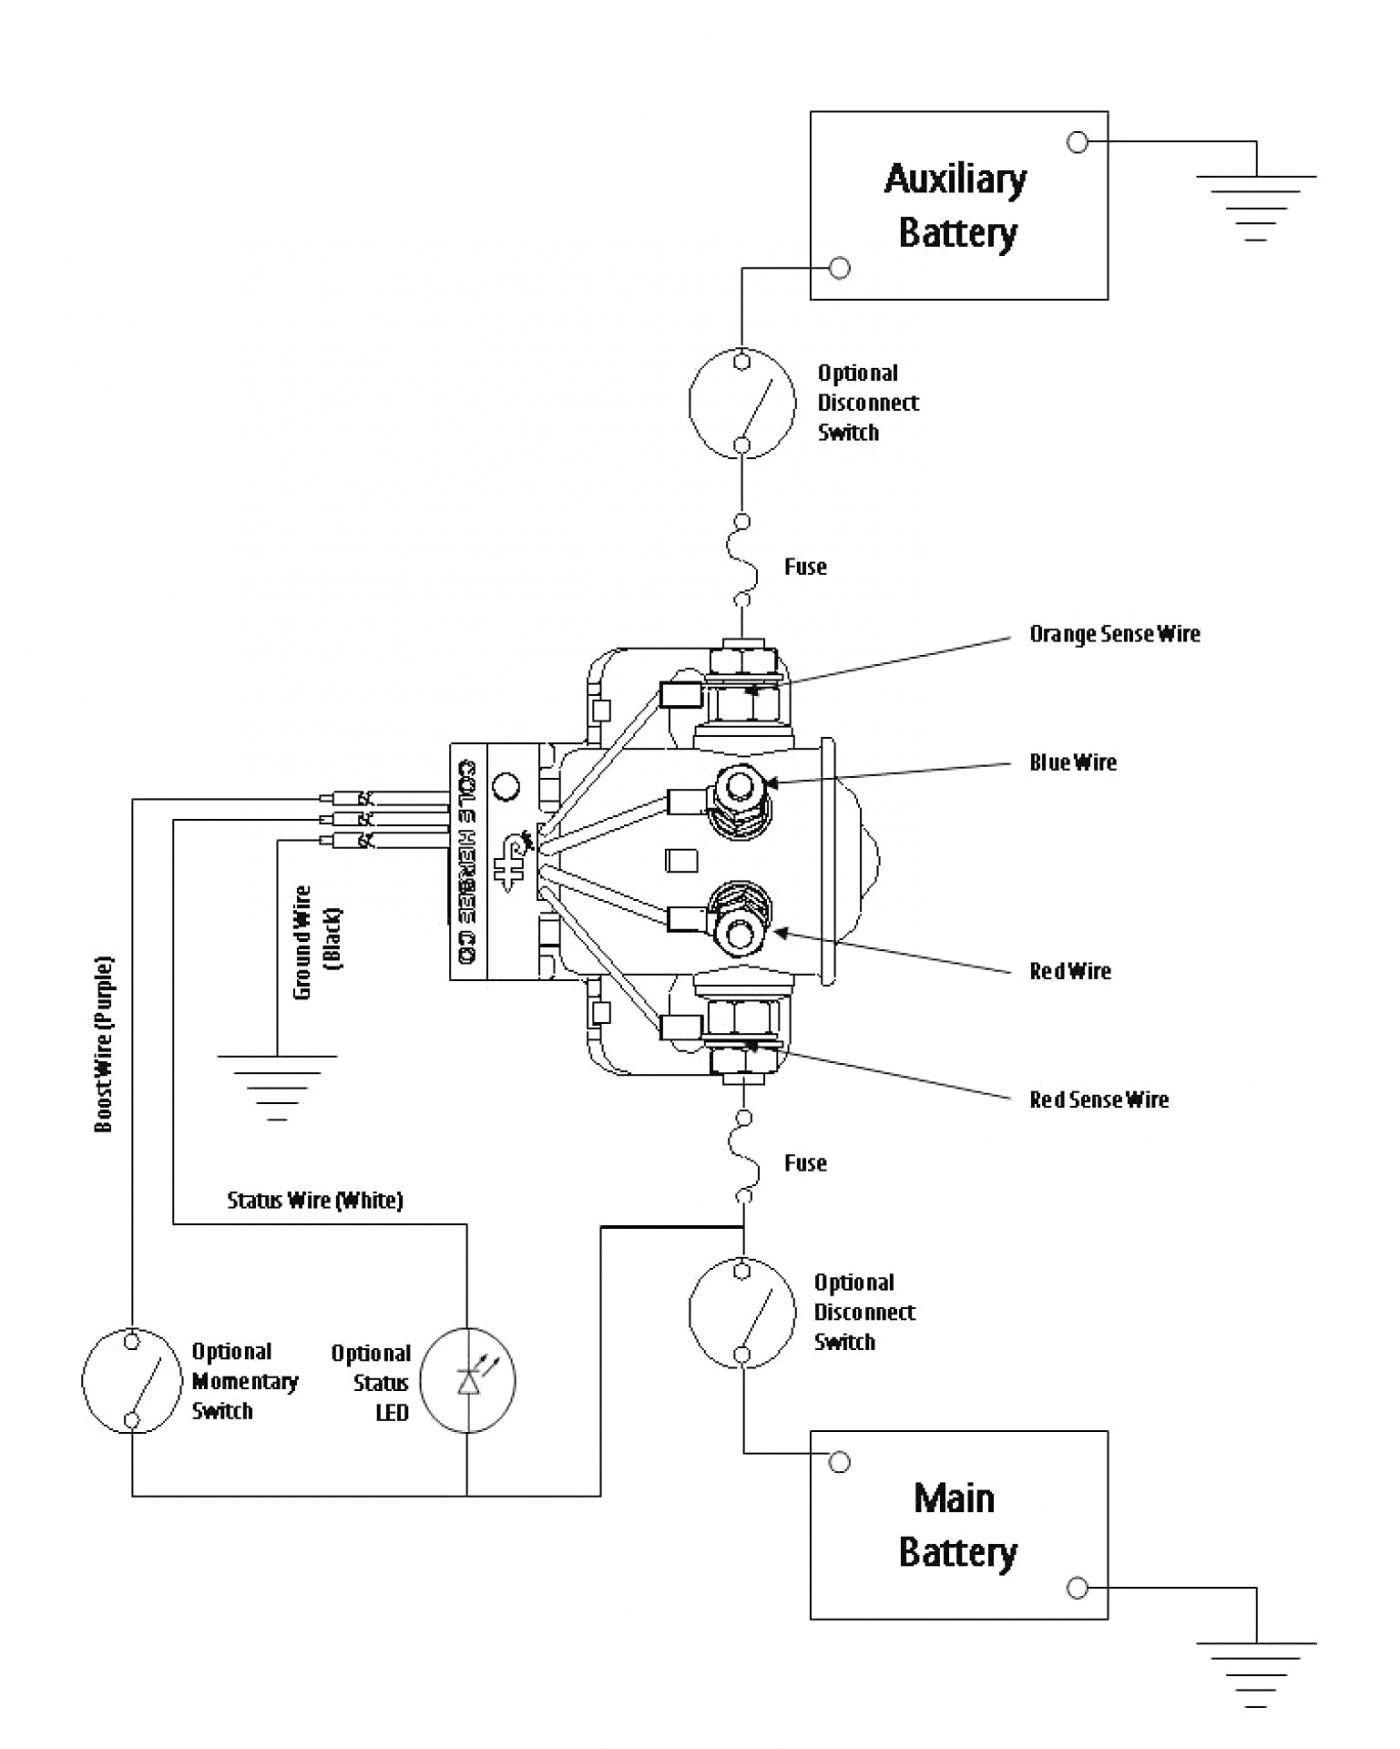 Harley Evolution Engine Diagram Dyna Coils Wiring Diagram 1995 Schematics Wiring Diagrams • Of Harley Evolution Engine Diagram